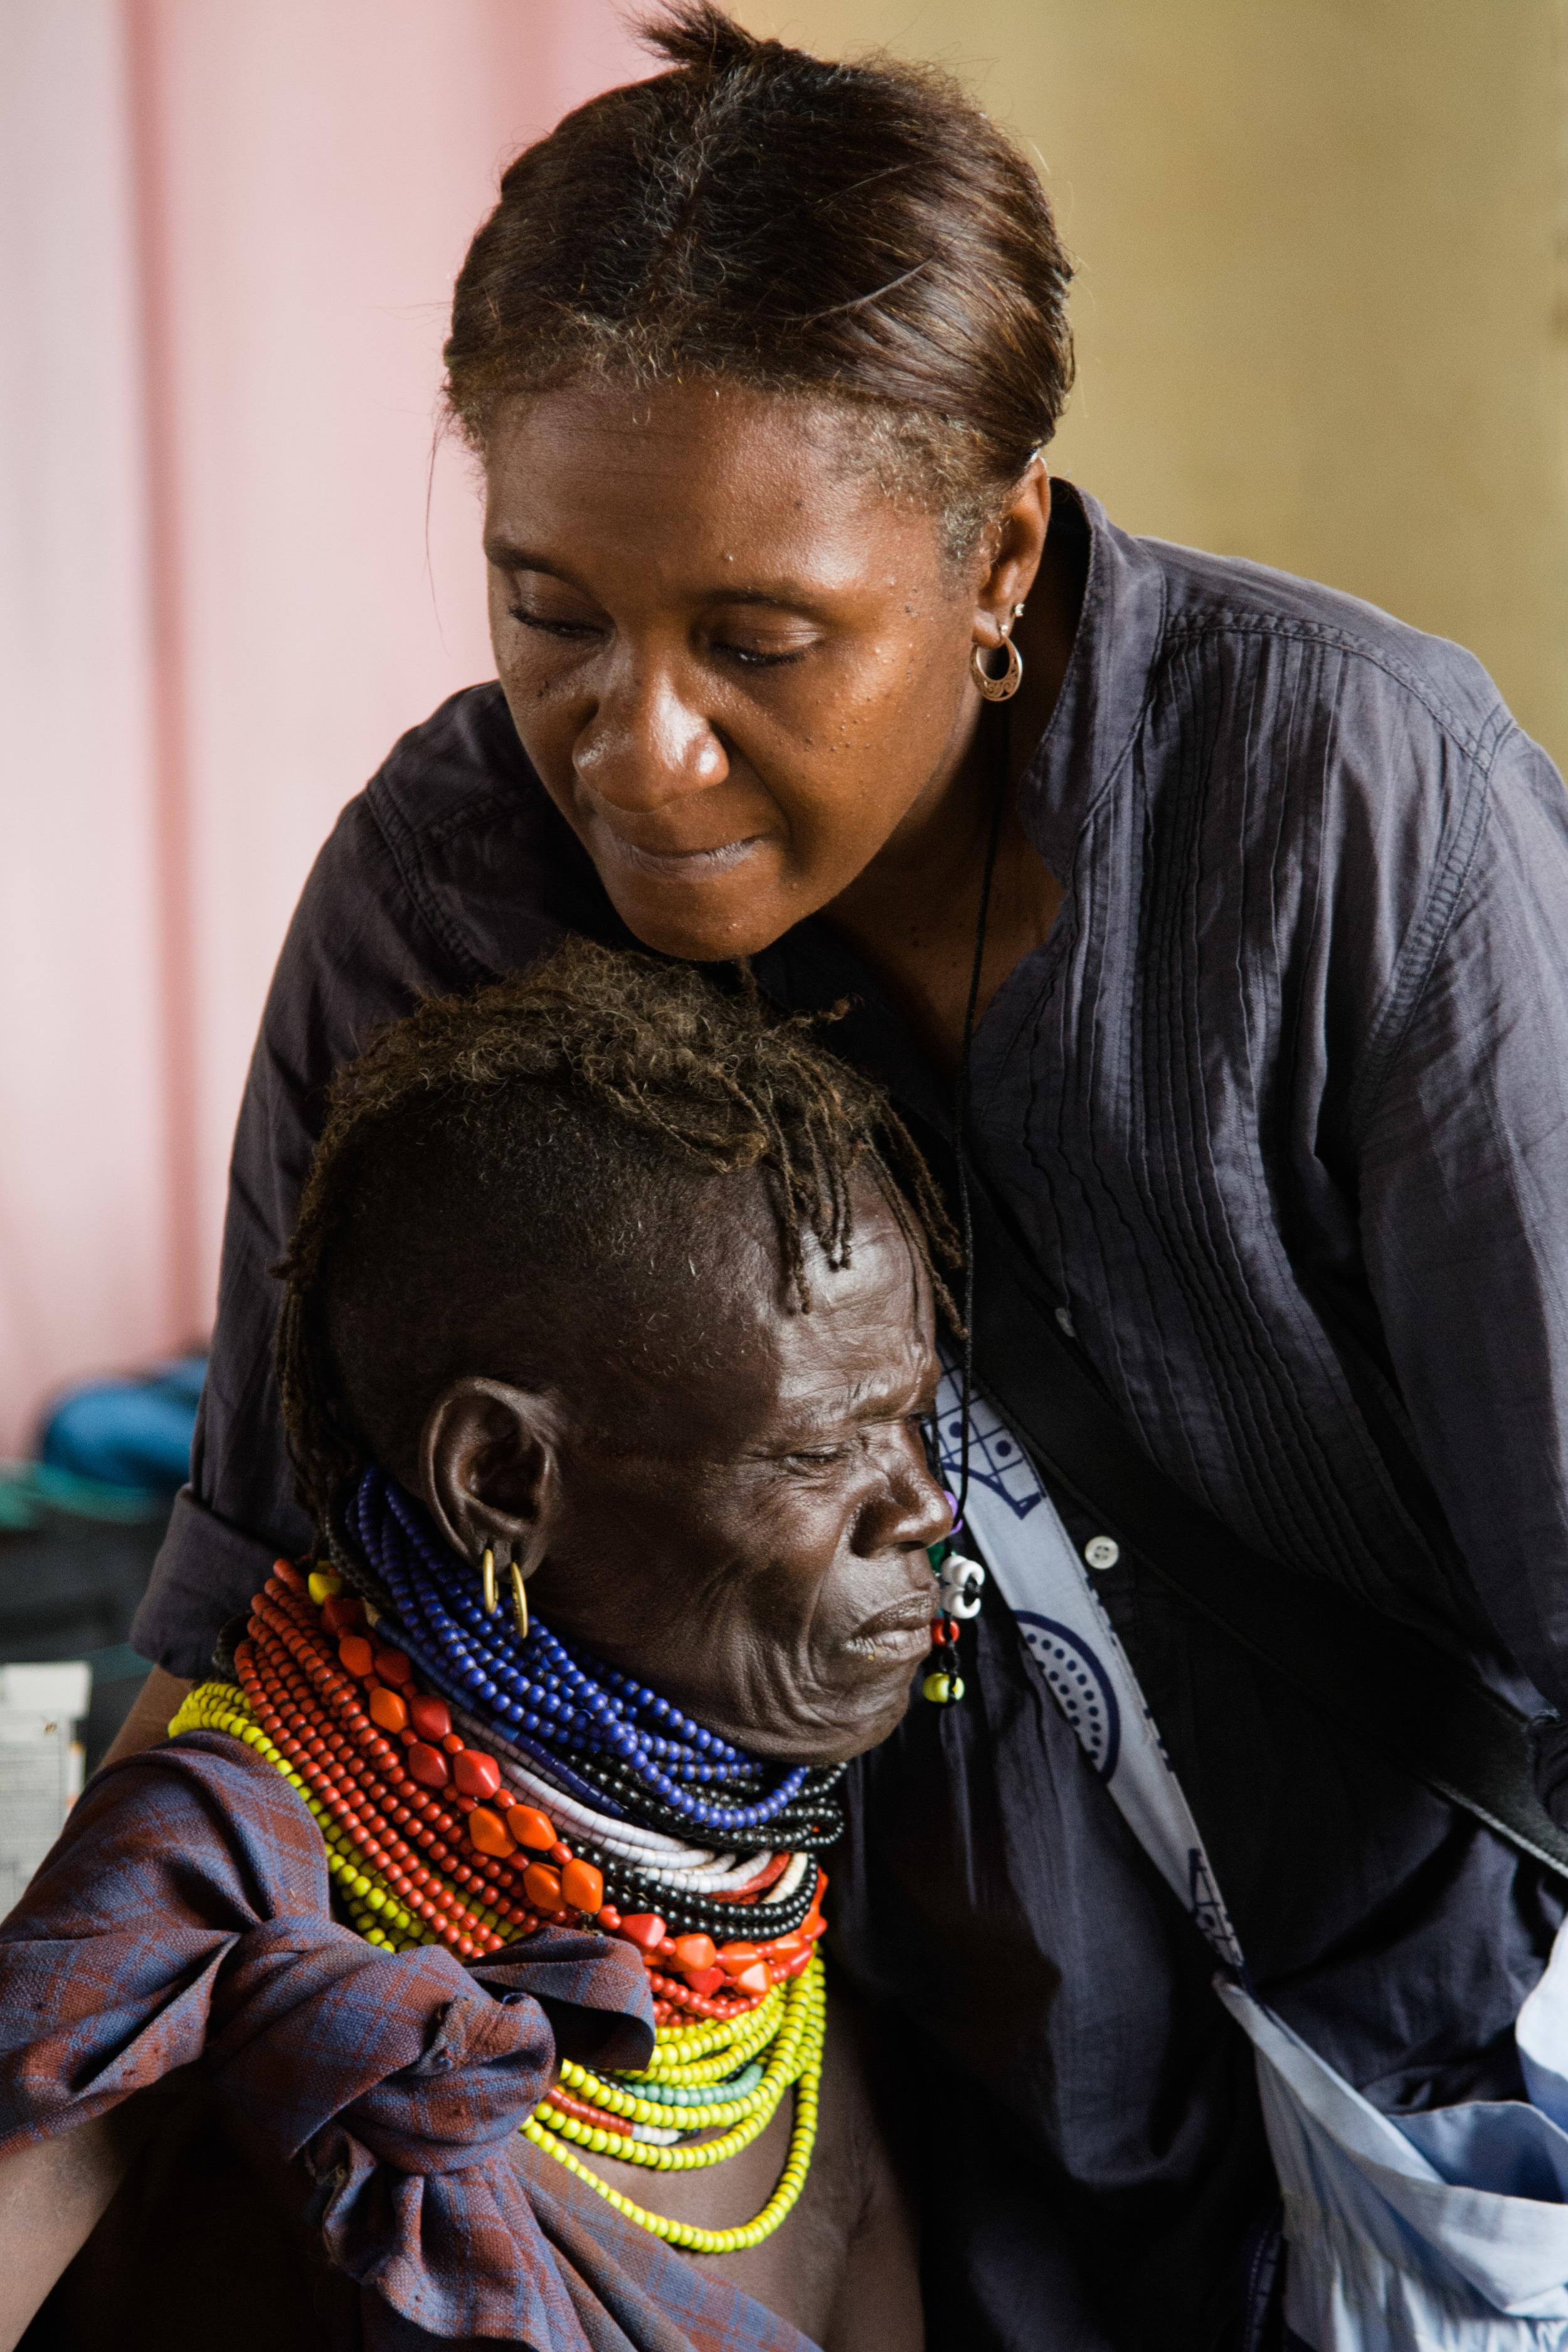 Shara comforting a woman receiving an IV line